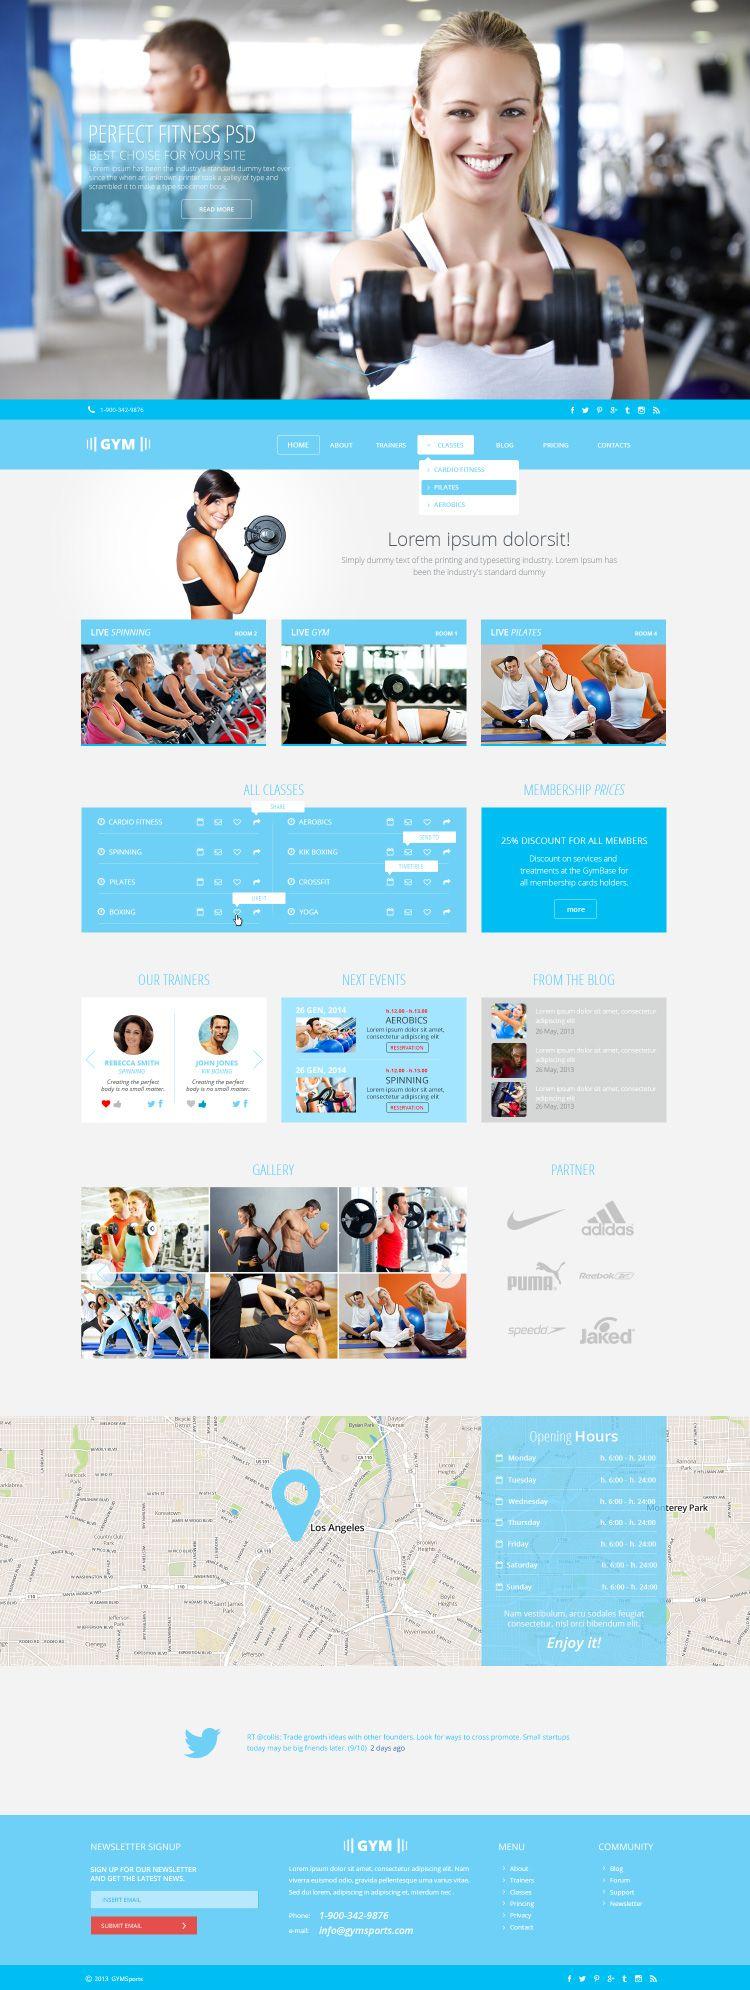 photoshop website templates